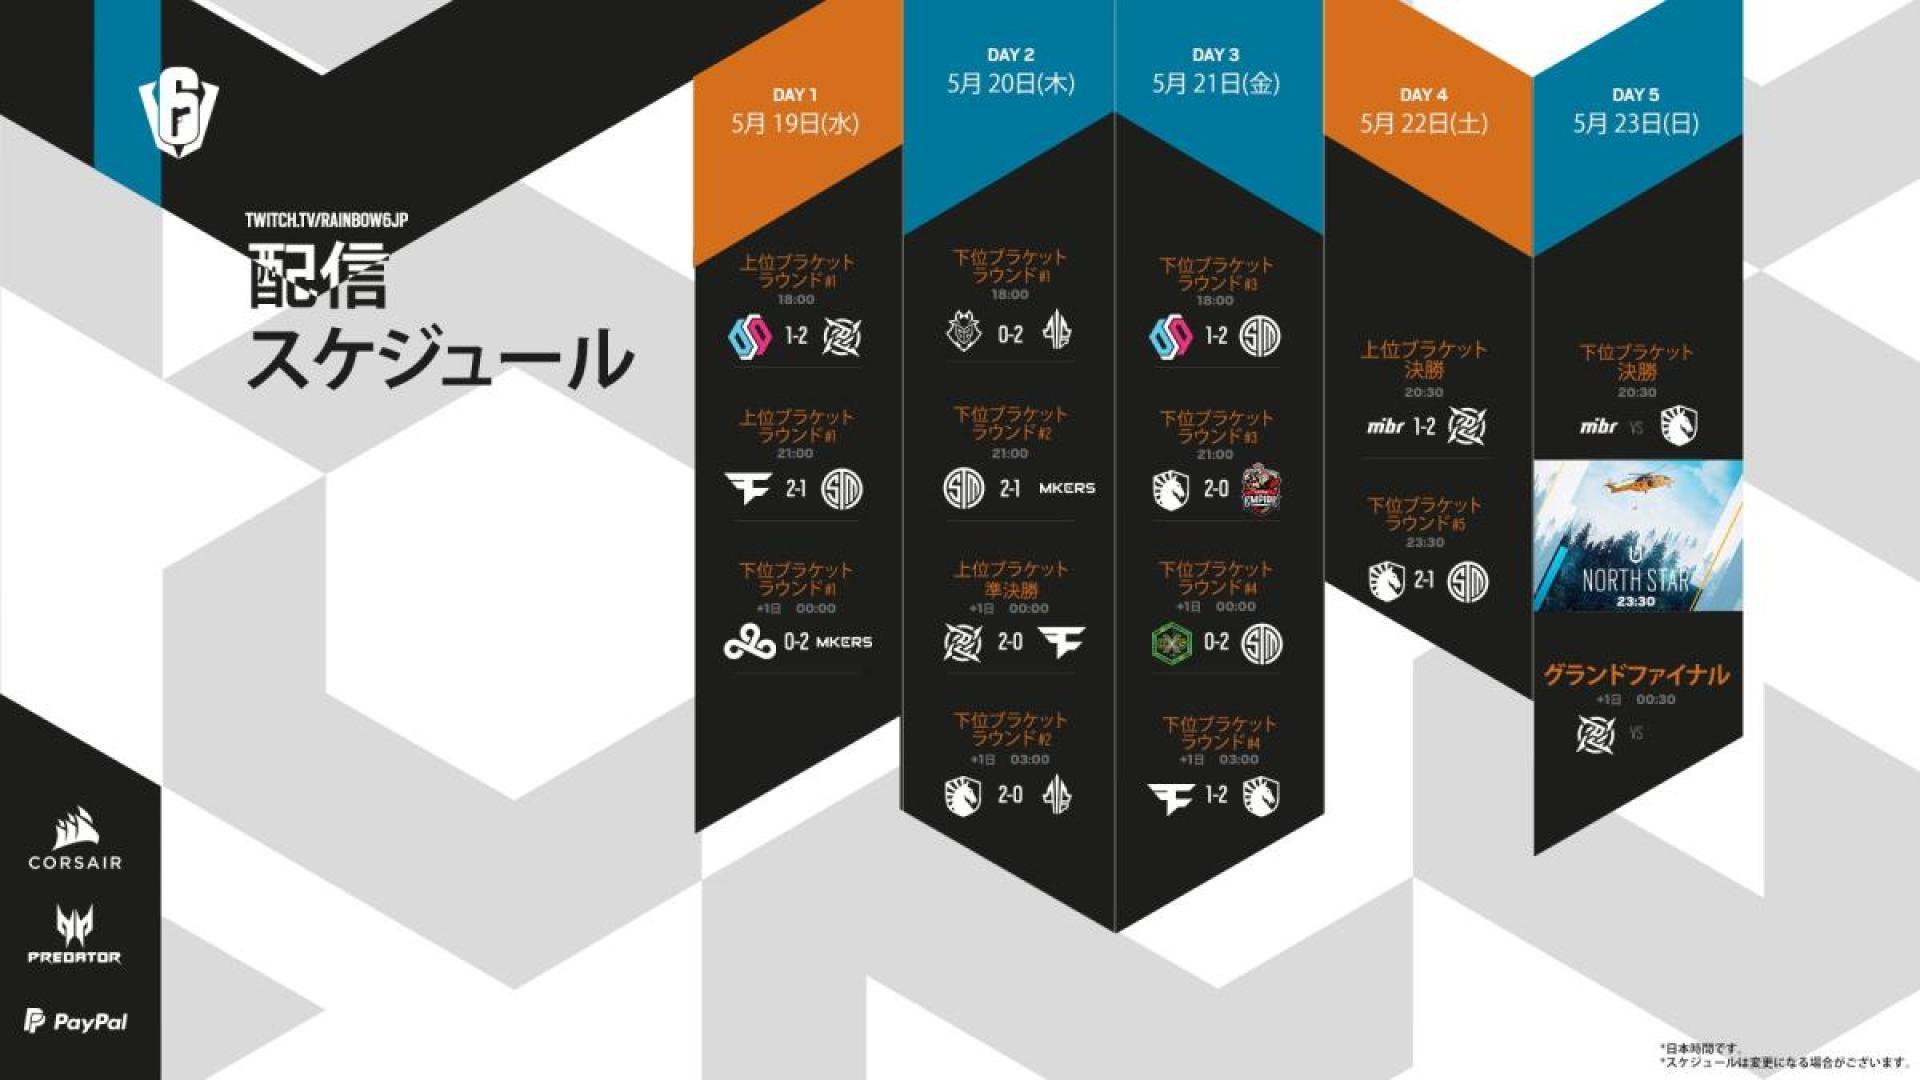 TSM vs Team Liquid __ SIX INVITATIONAL 2021 – UB Final – Day 4 8-39-44 screenshot